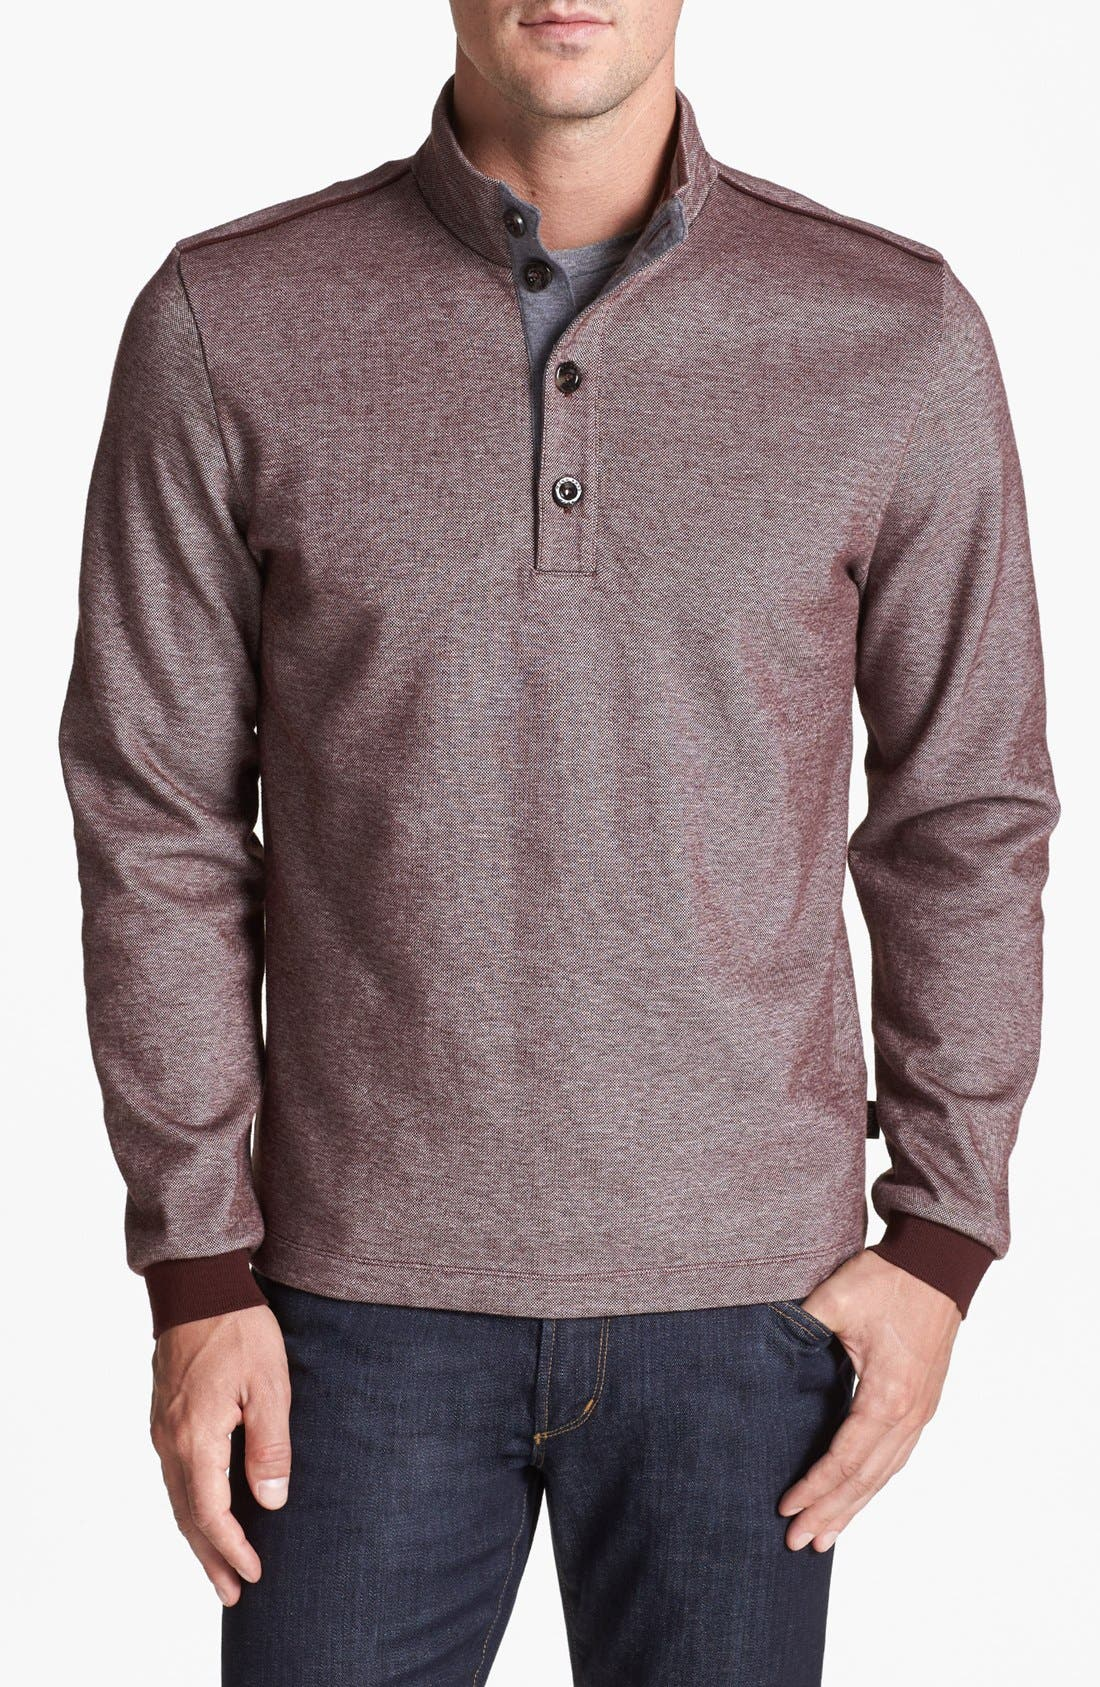 Alternate Image 1 Selected - BOSS HUGO BOSS 'Piceno' Mock Neck Sweatshirt